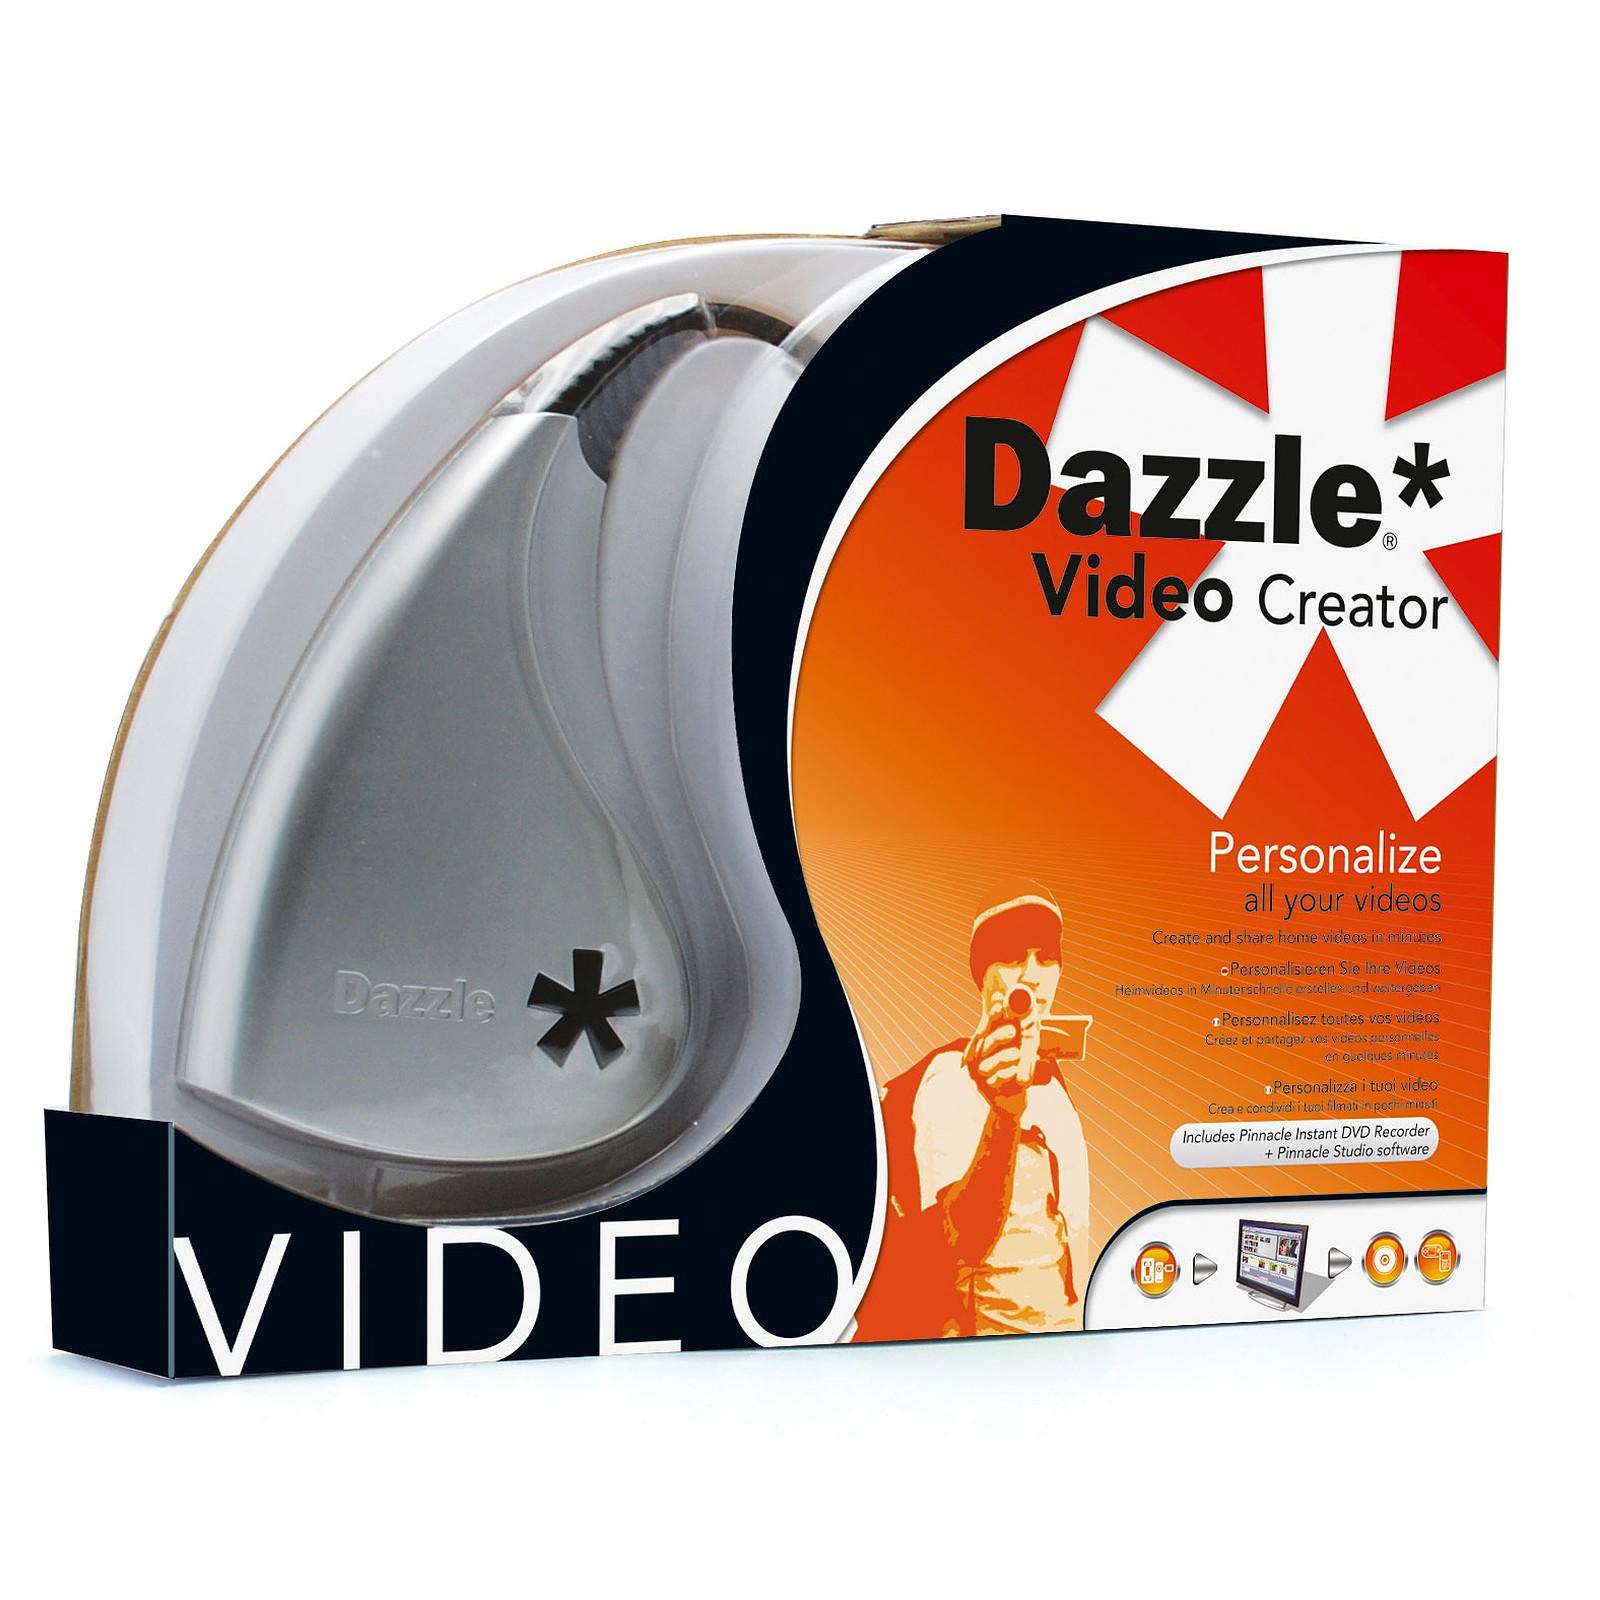 Dazzle Video Creator II